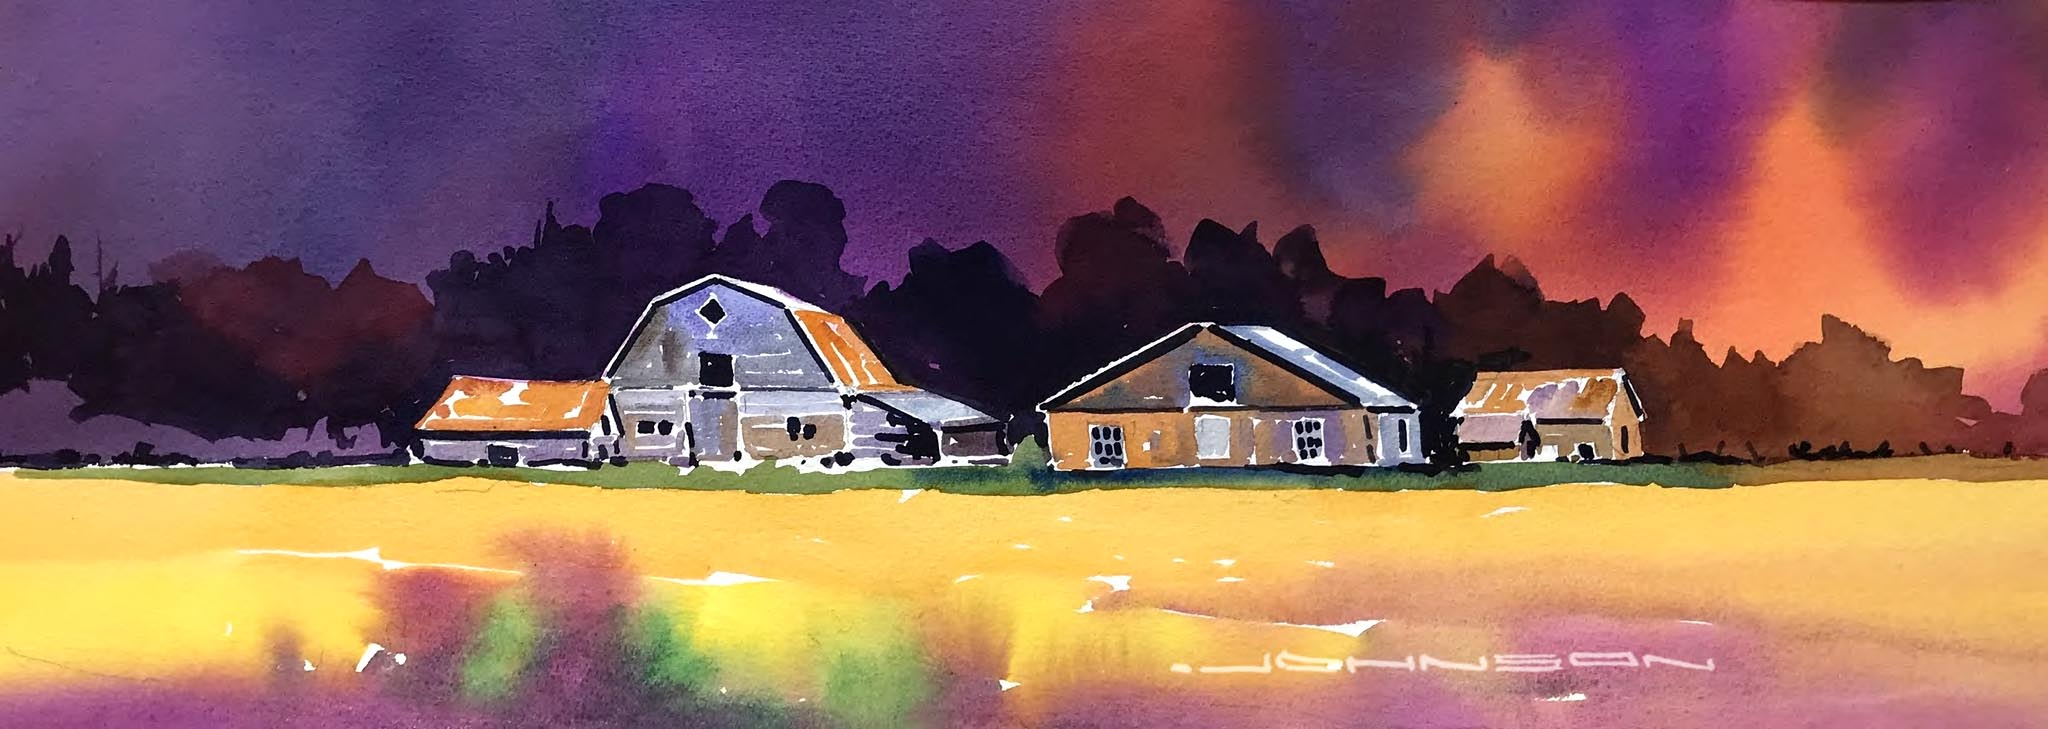 Abandoned Farm and Canola Field - Gregg Johnson